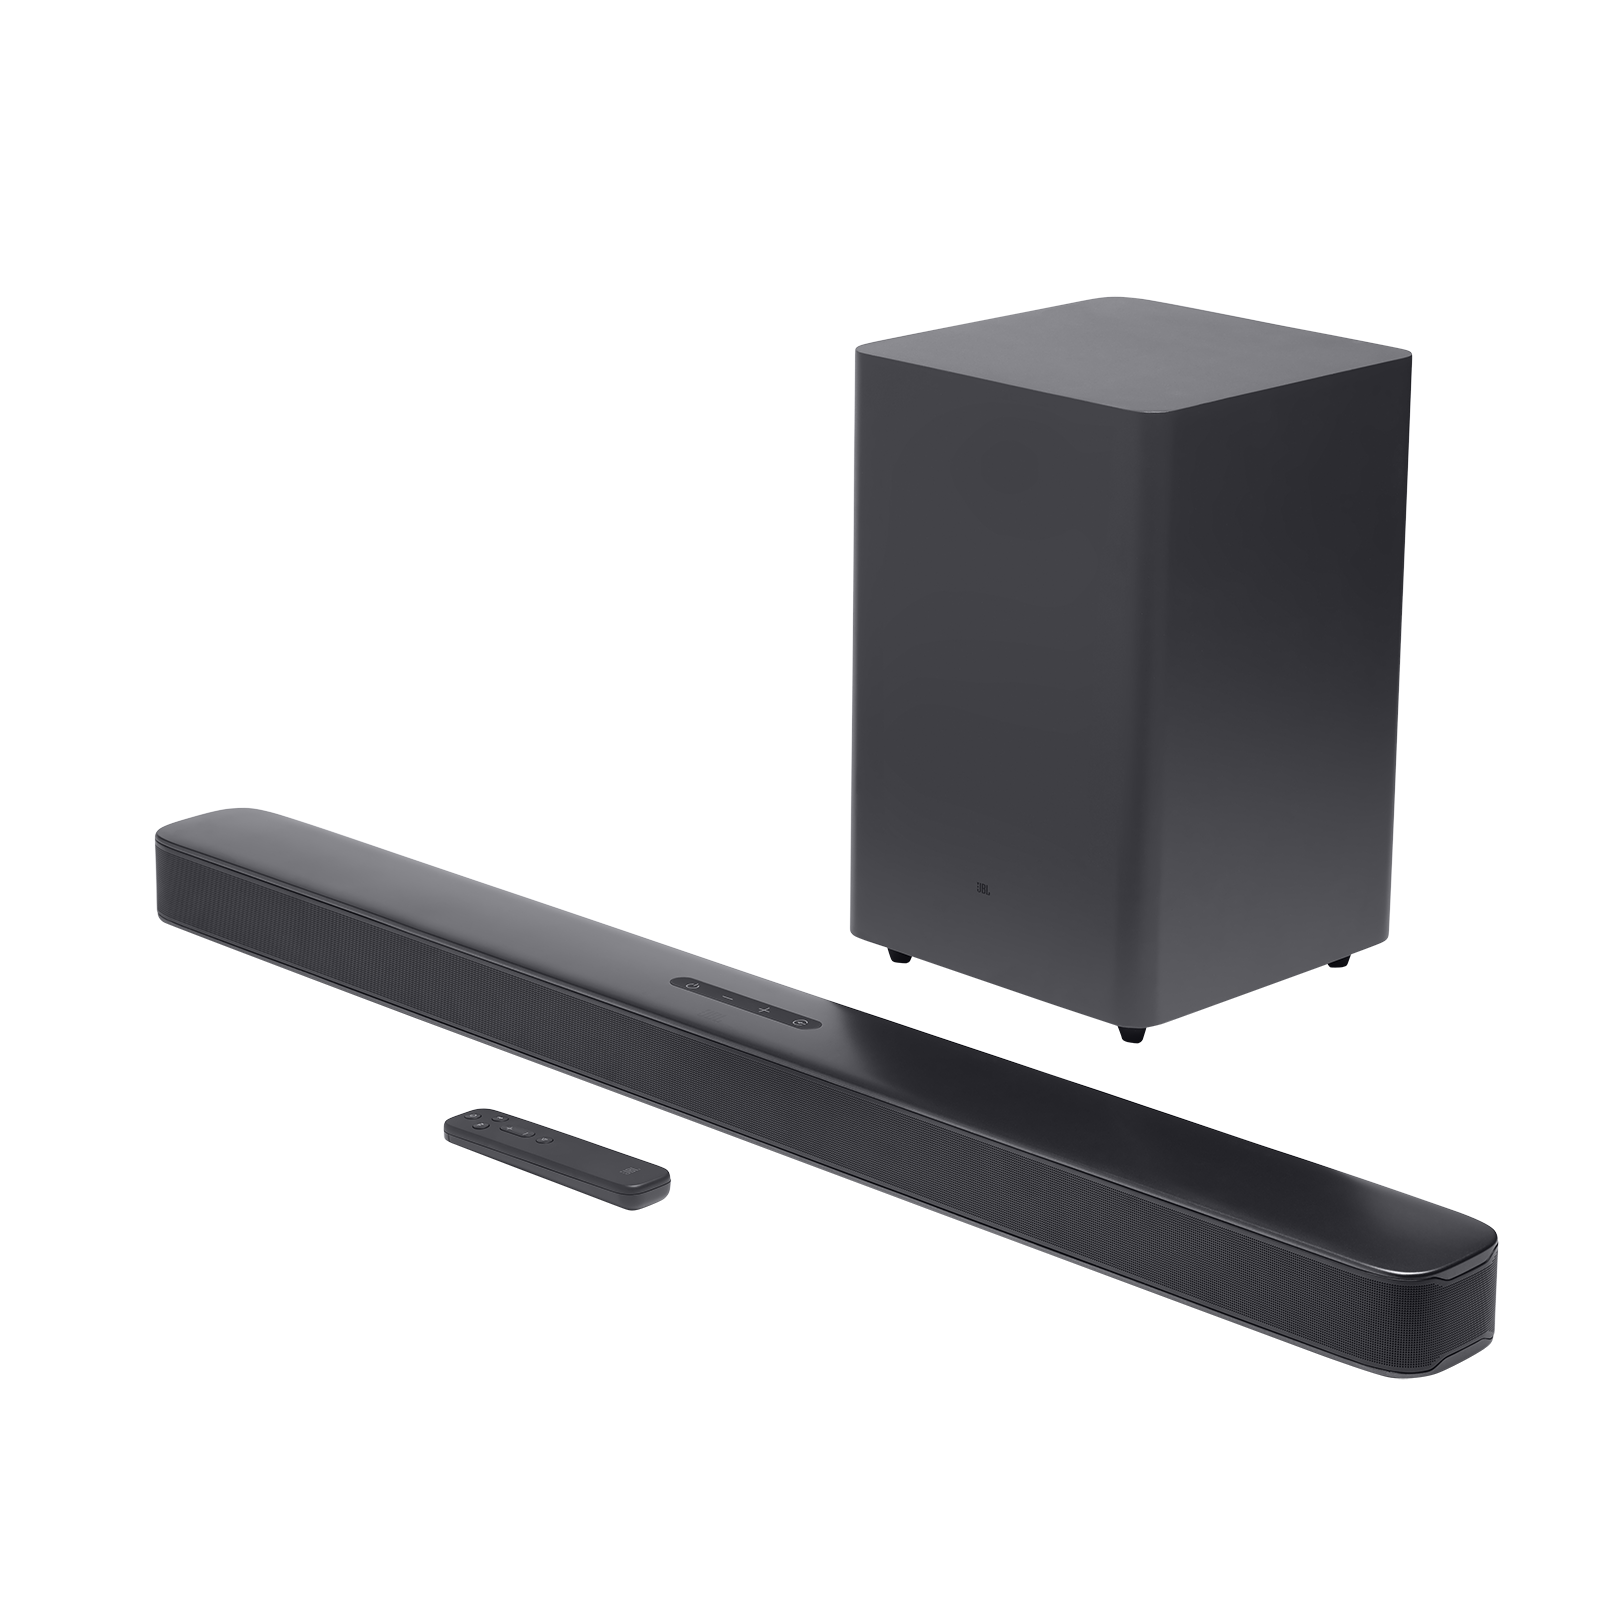 JBL Bar 2.1 Deep Bass - Black - 2.1 channel soundbar with wireless subwoofer - Hero